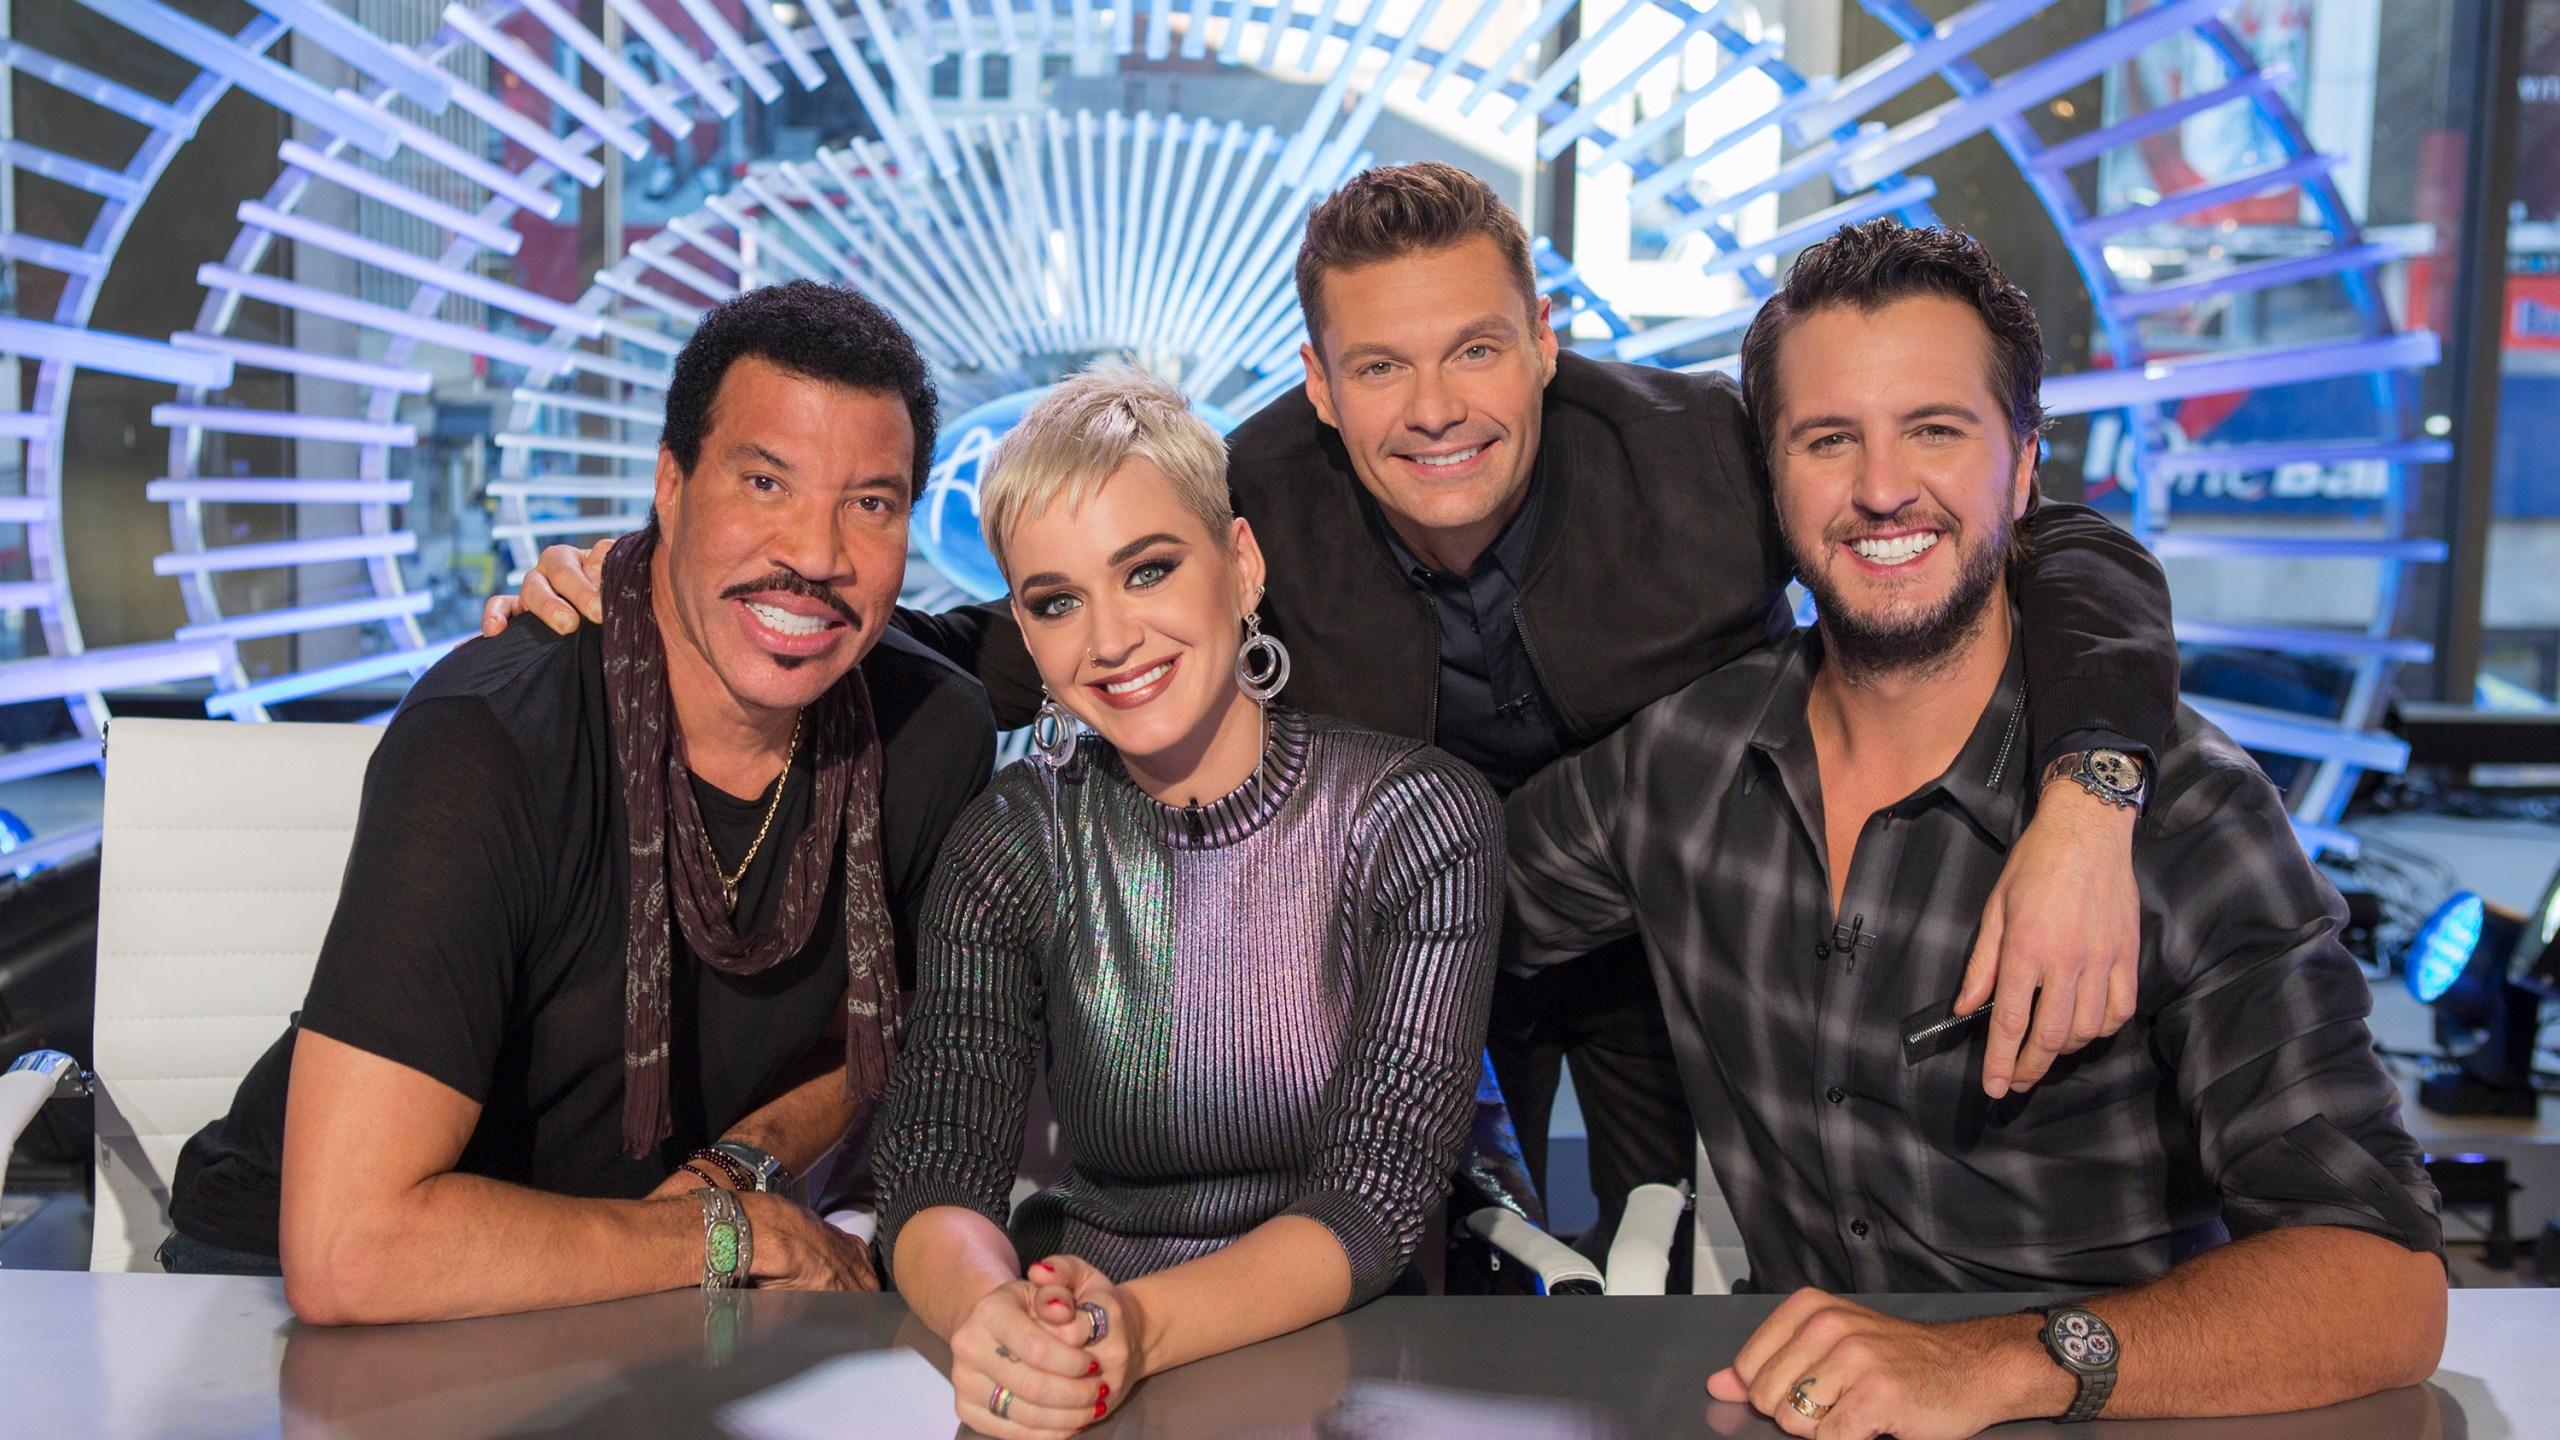 TV_American_Idol_12640-159532.jpg29371928